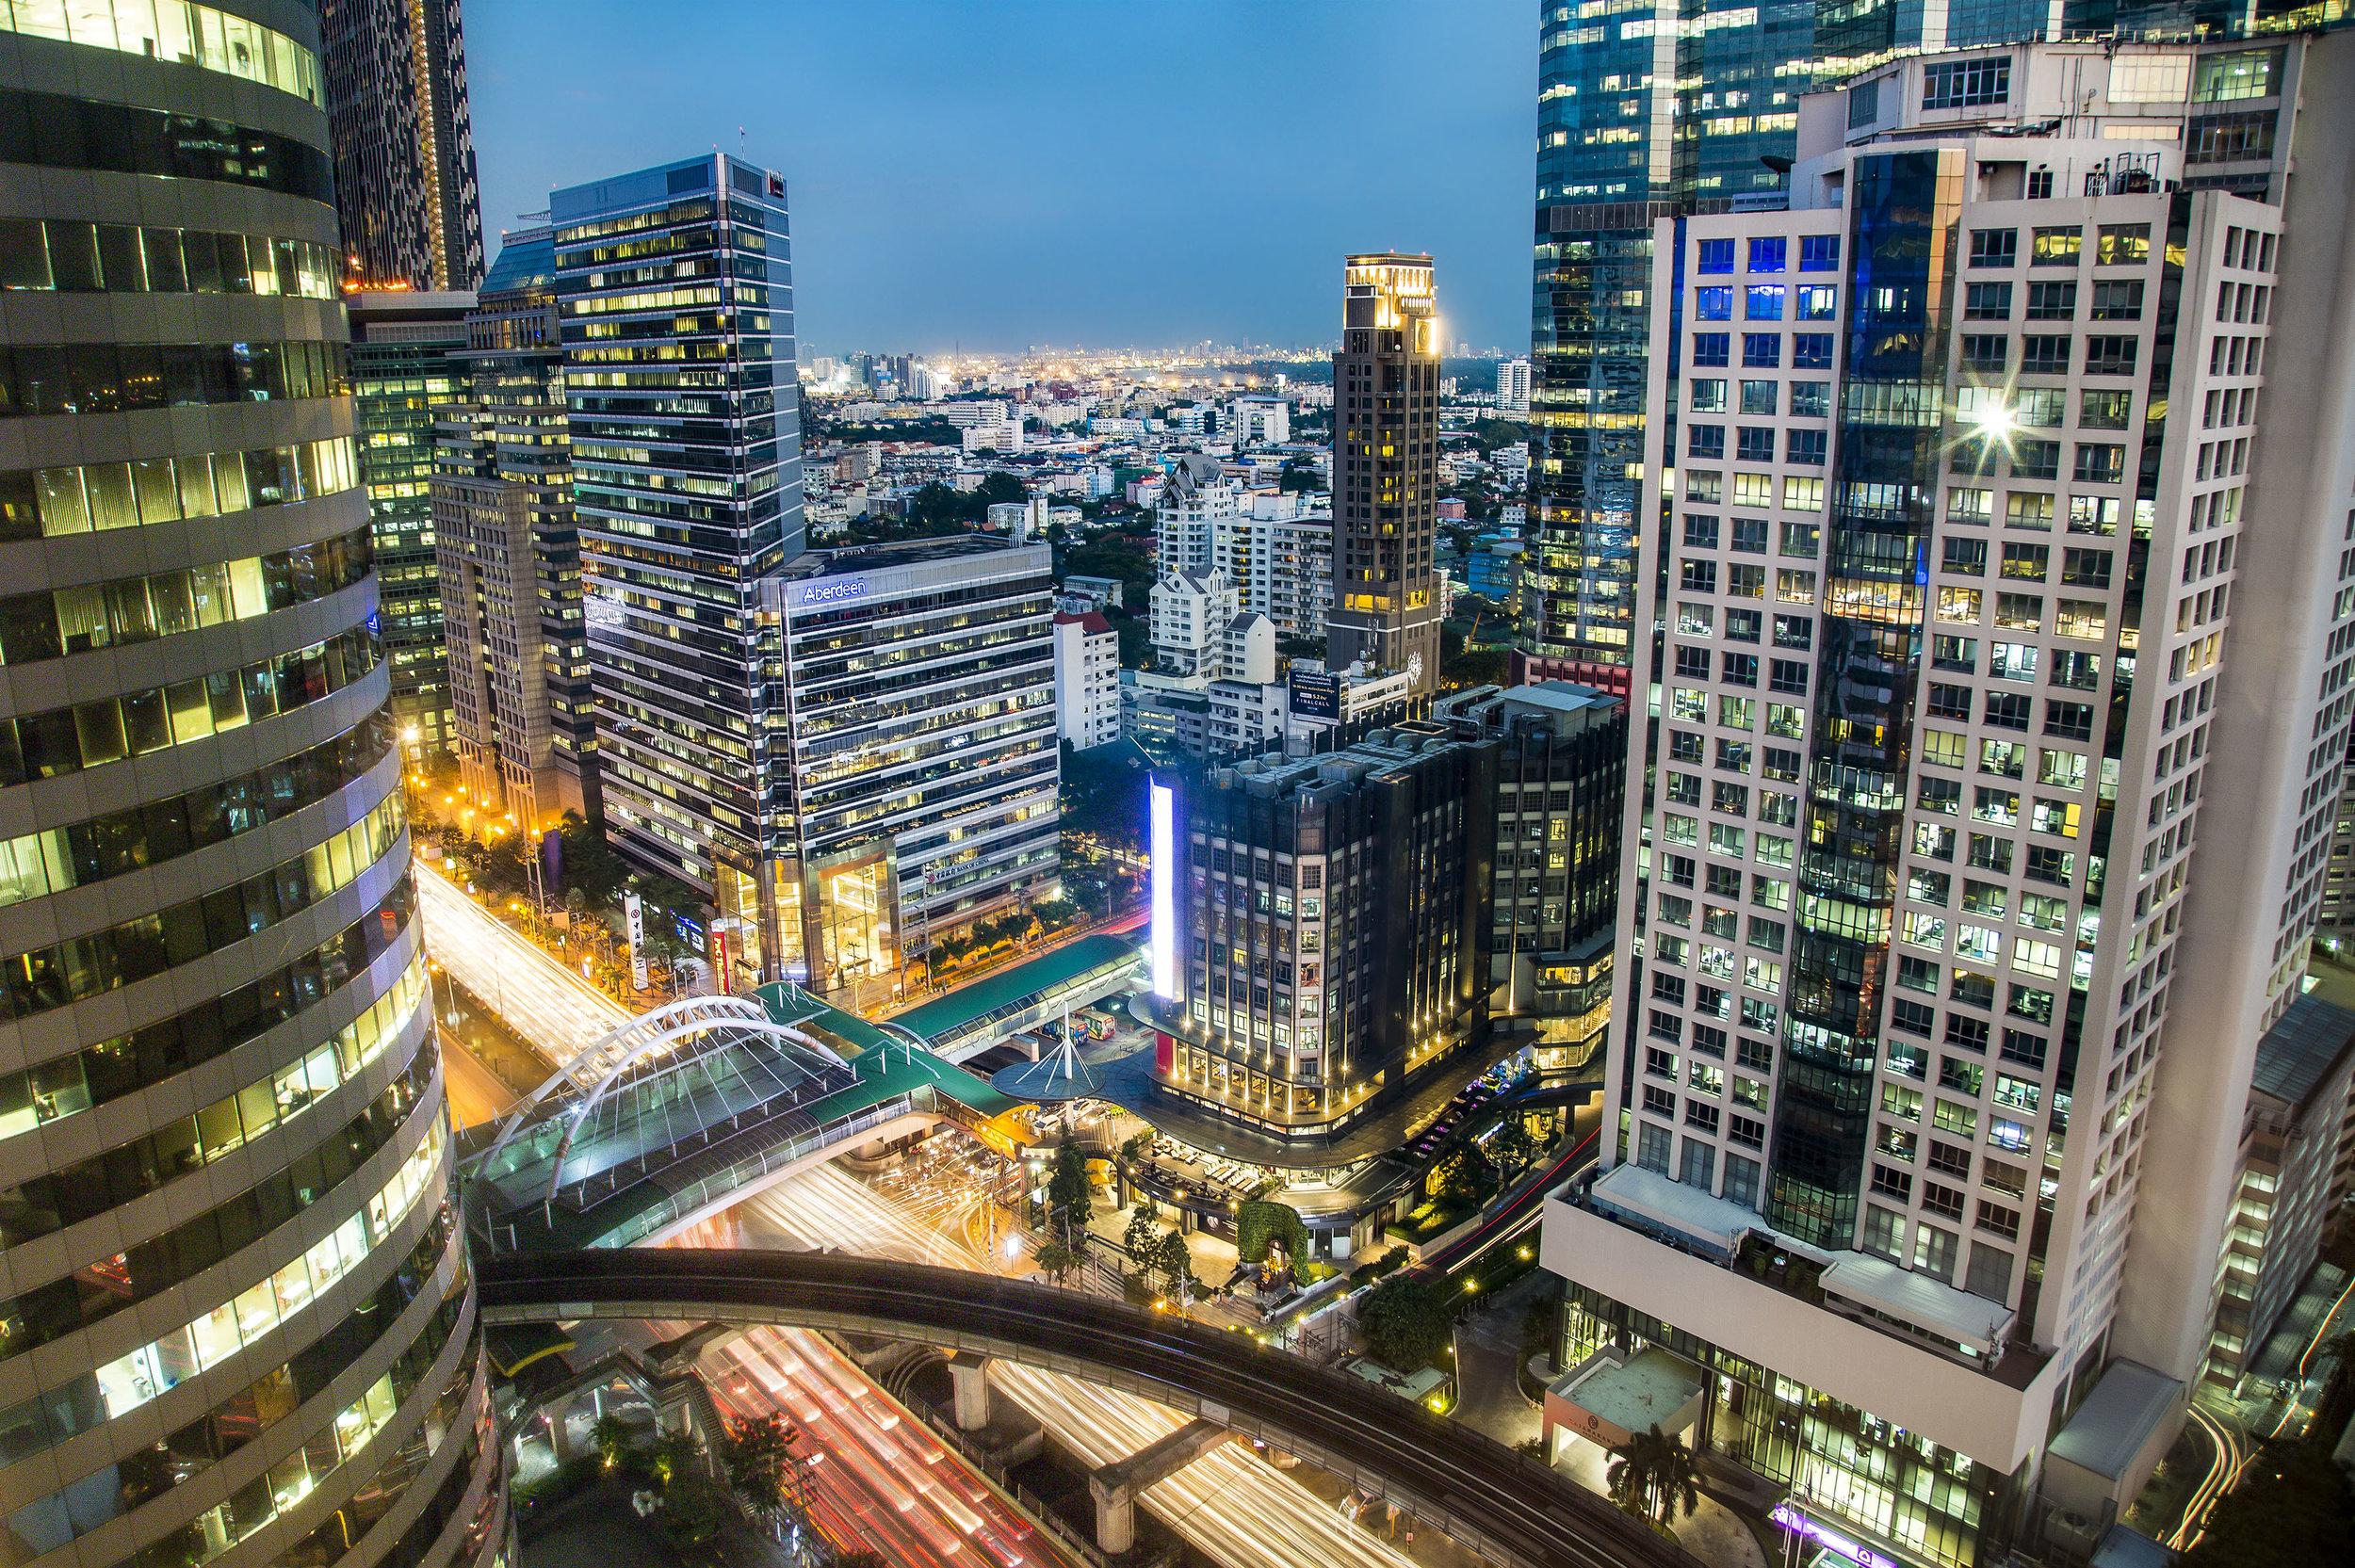 BangkokTwilight-m.jpg